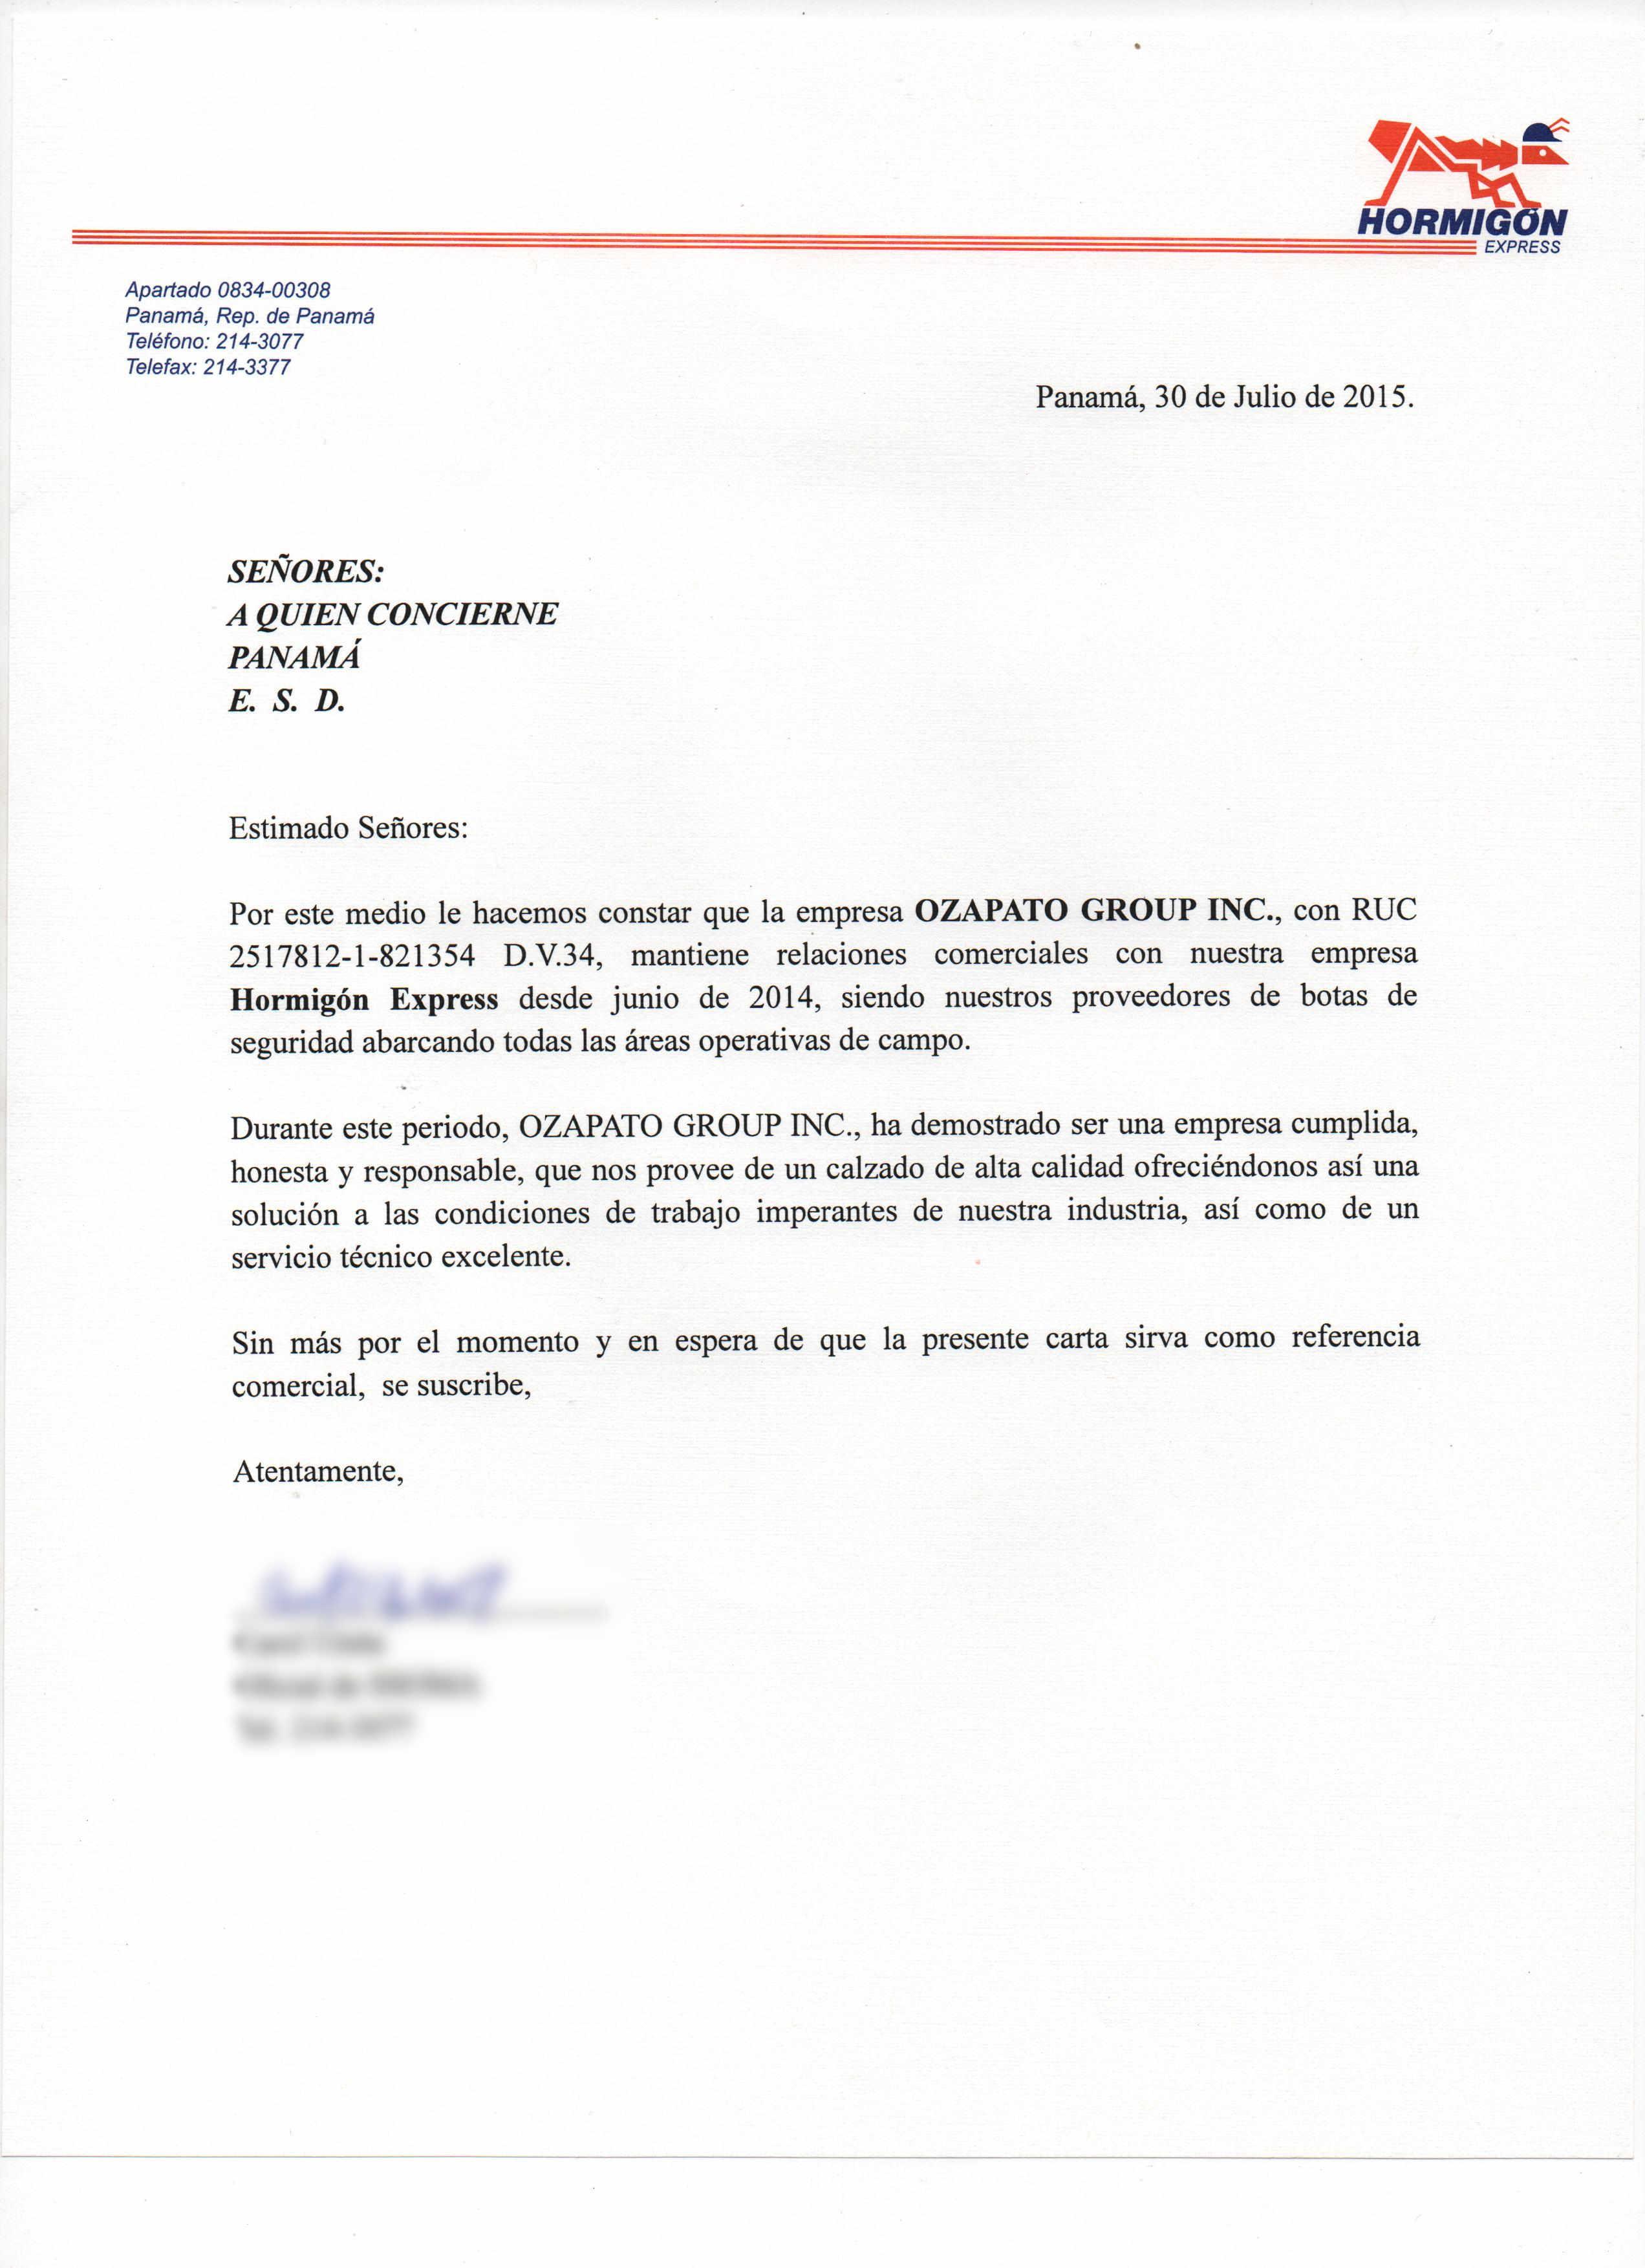 carta de referencia hormig u00f3n express